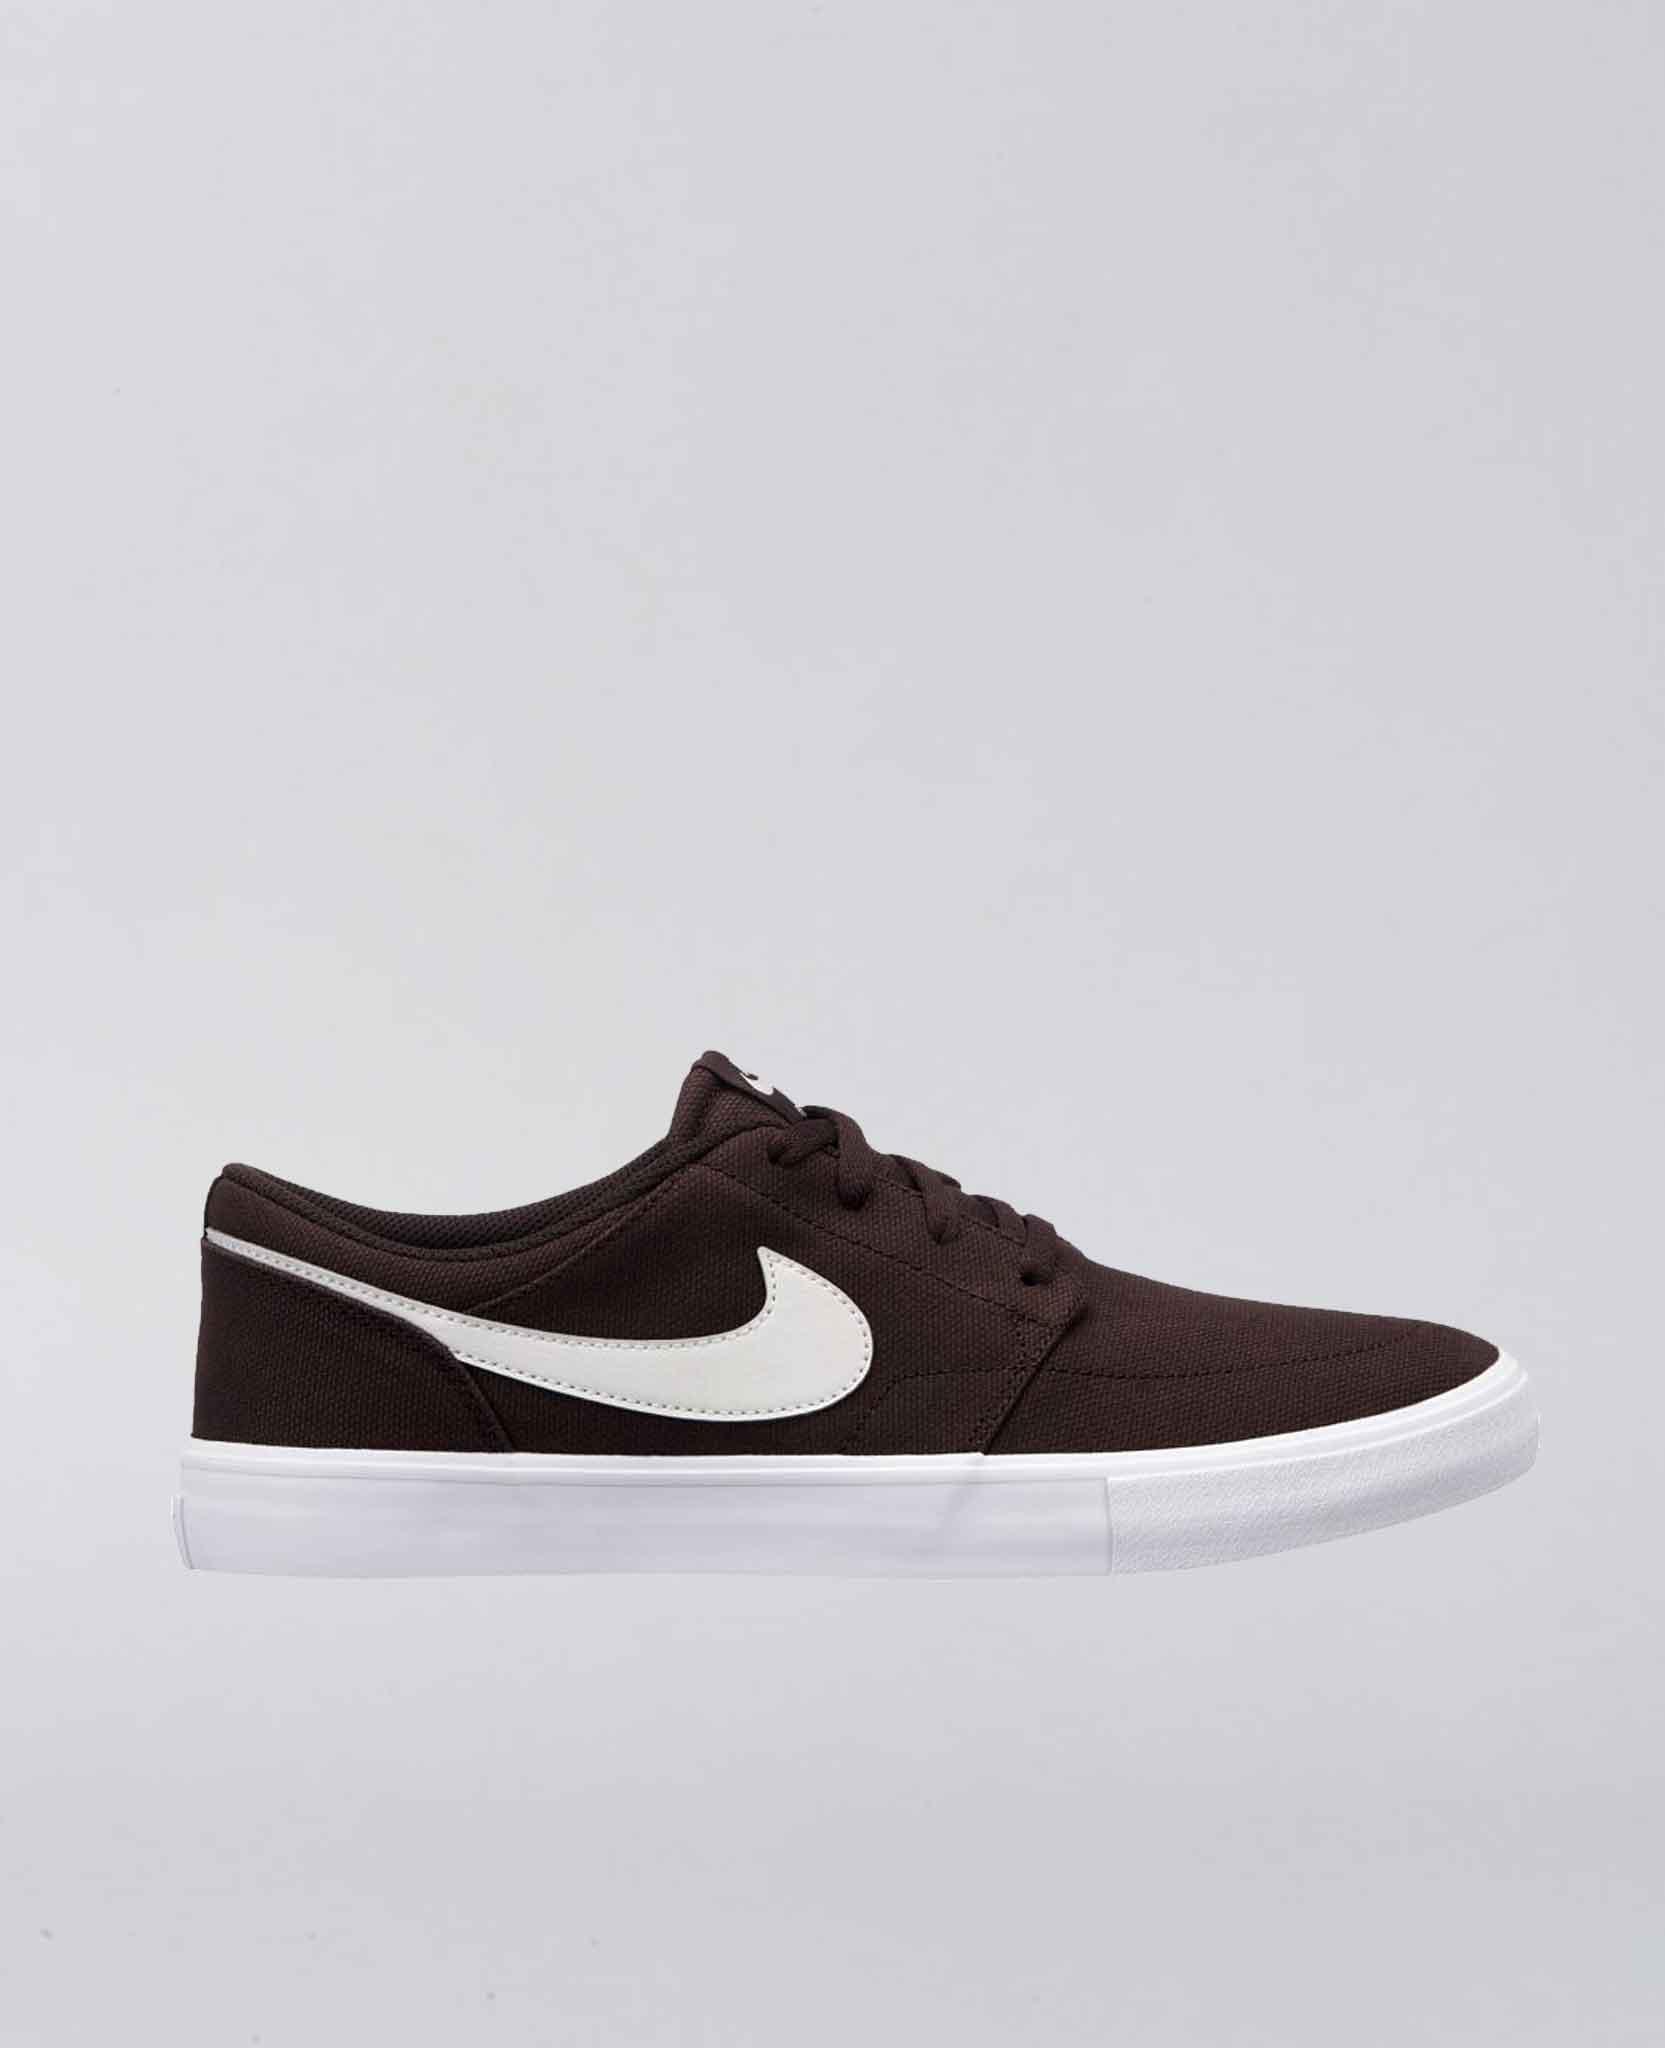 Portmore II Velvet Brown Shoes